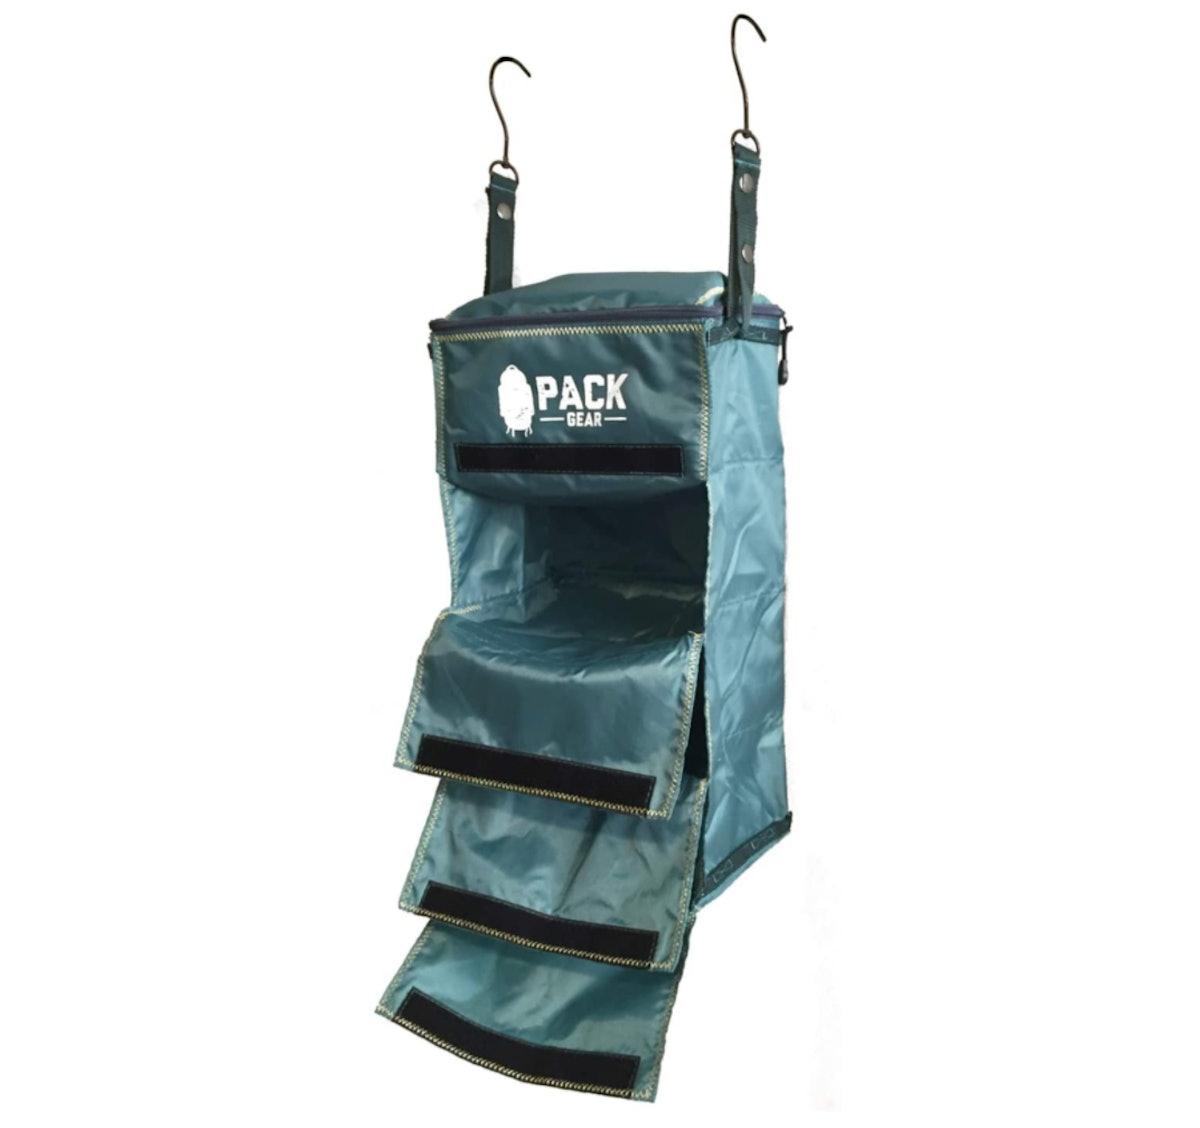 Pack Gear Portable Luggage Organizer